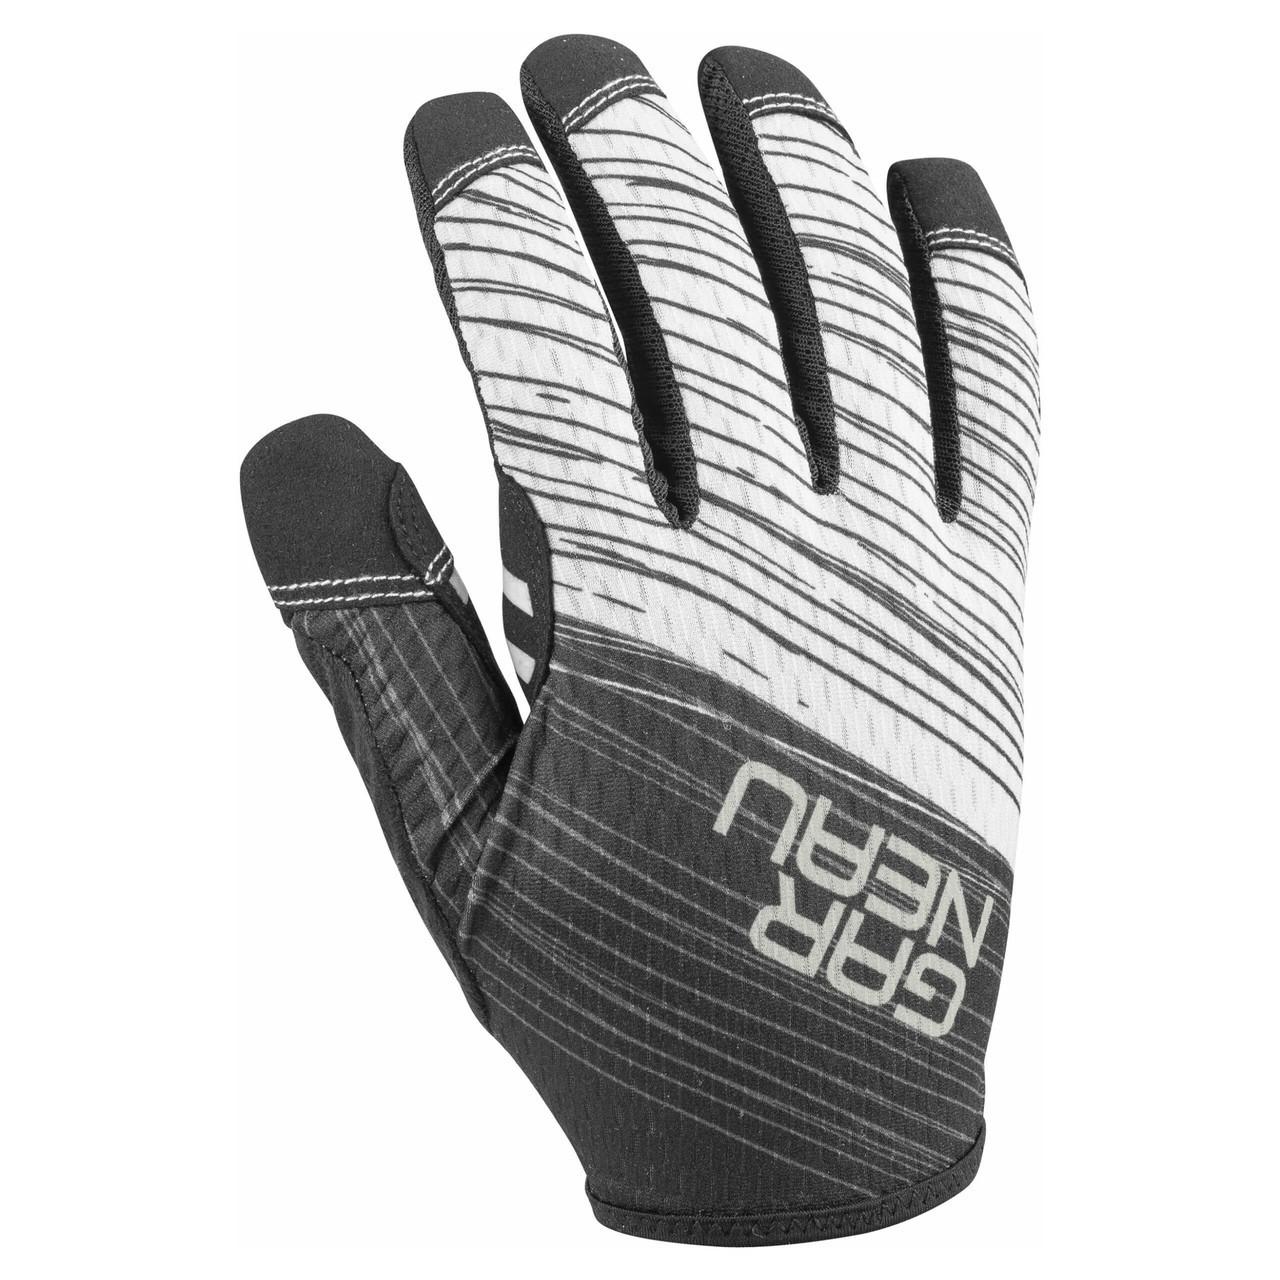 Louis Garneau Wapiti Full Finger Bike Glove - 2019 price